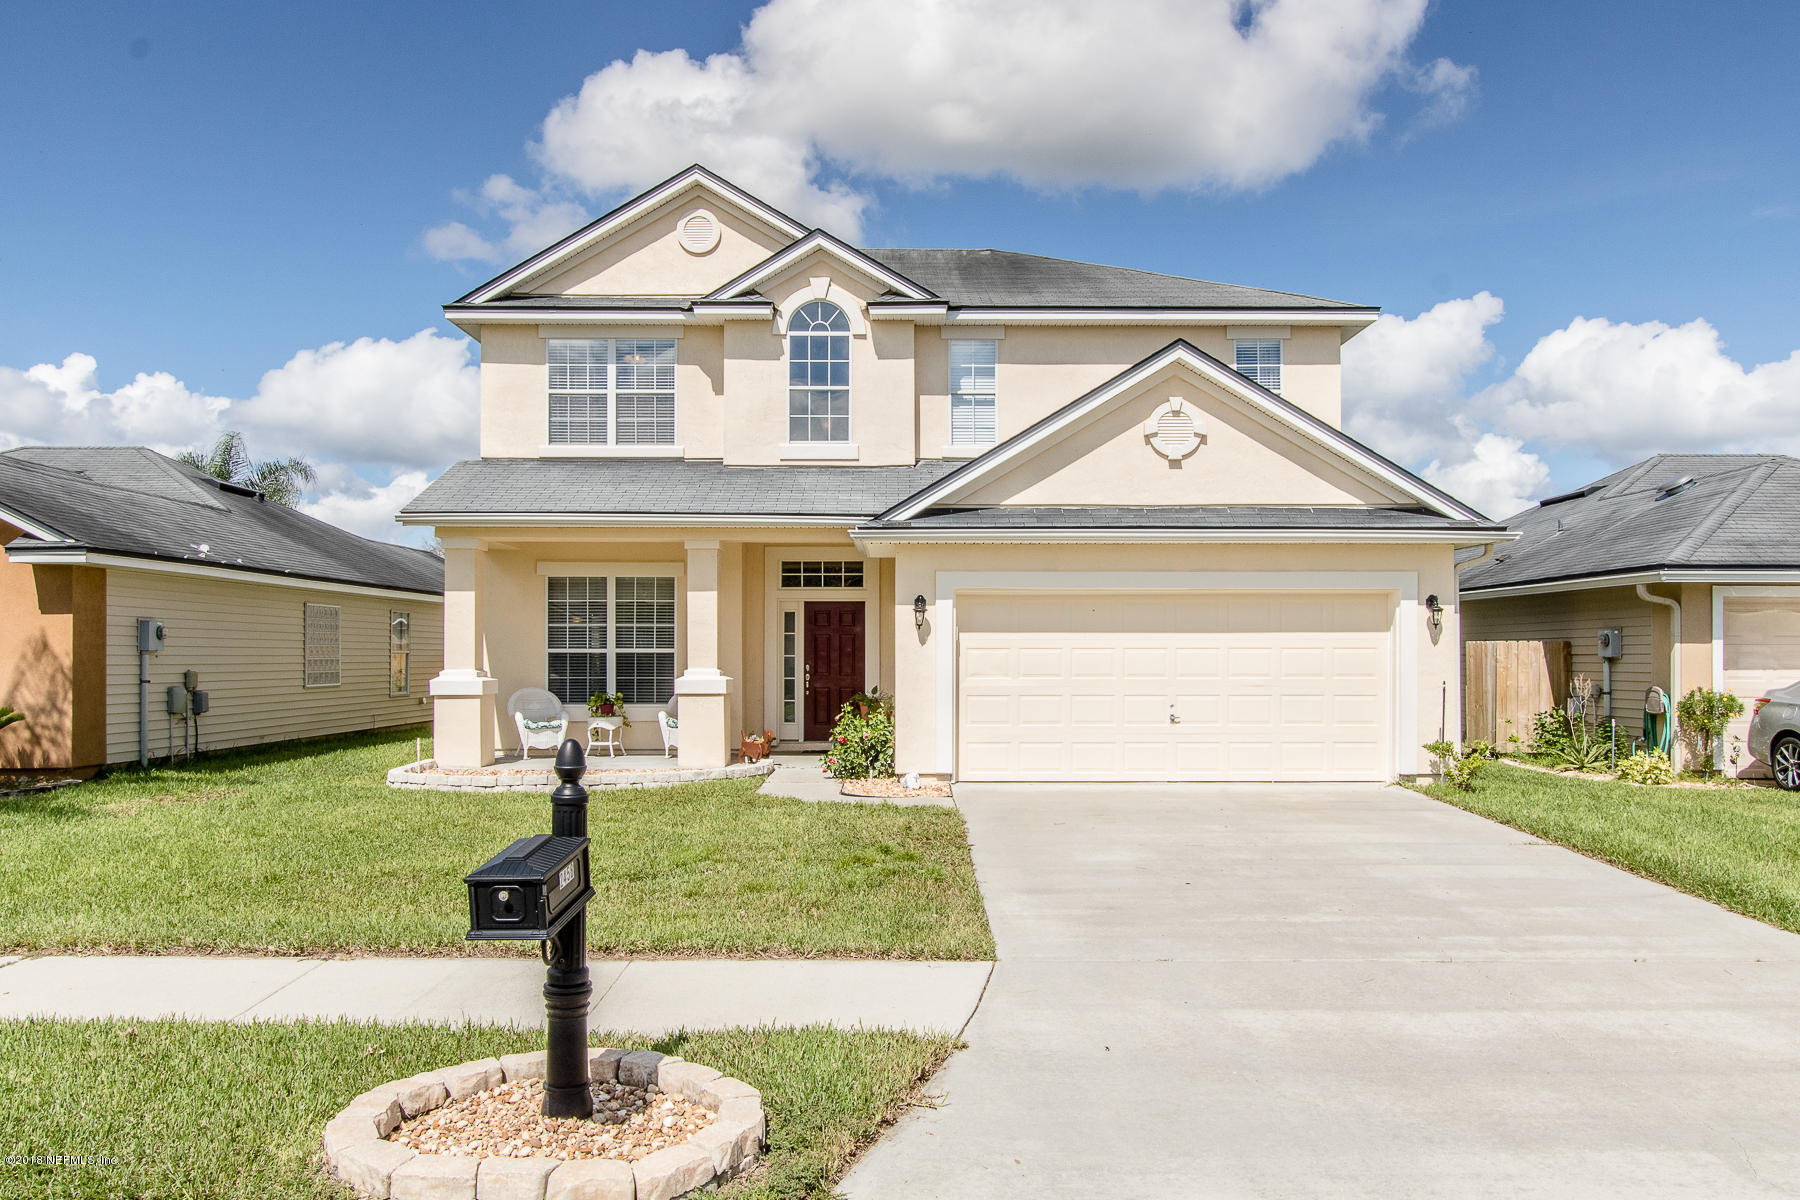 2458 CREEKFRONT, GREEN COVE SPRINGS, FLORIDA 32043, 4 Bedrooms Bedrooms, ,2 BathroomsBathrooms,Residential - single family,For sale,CREEKFRONT,957061